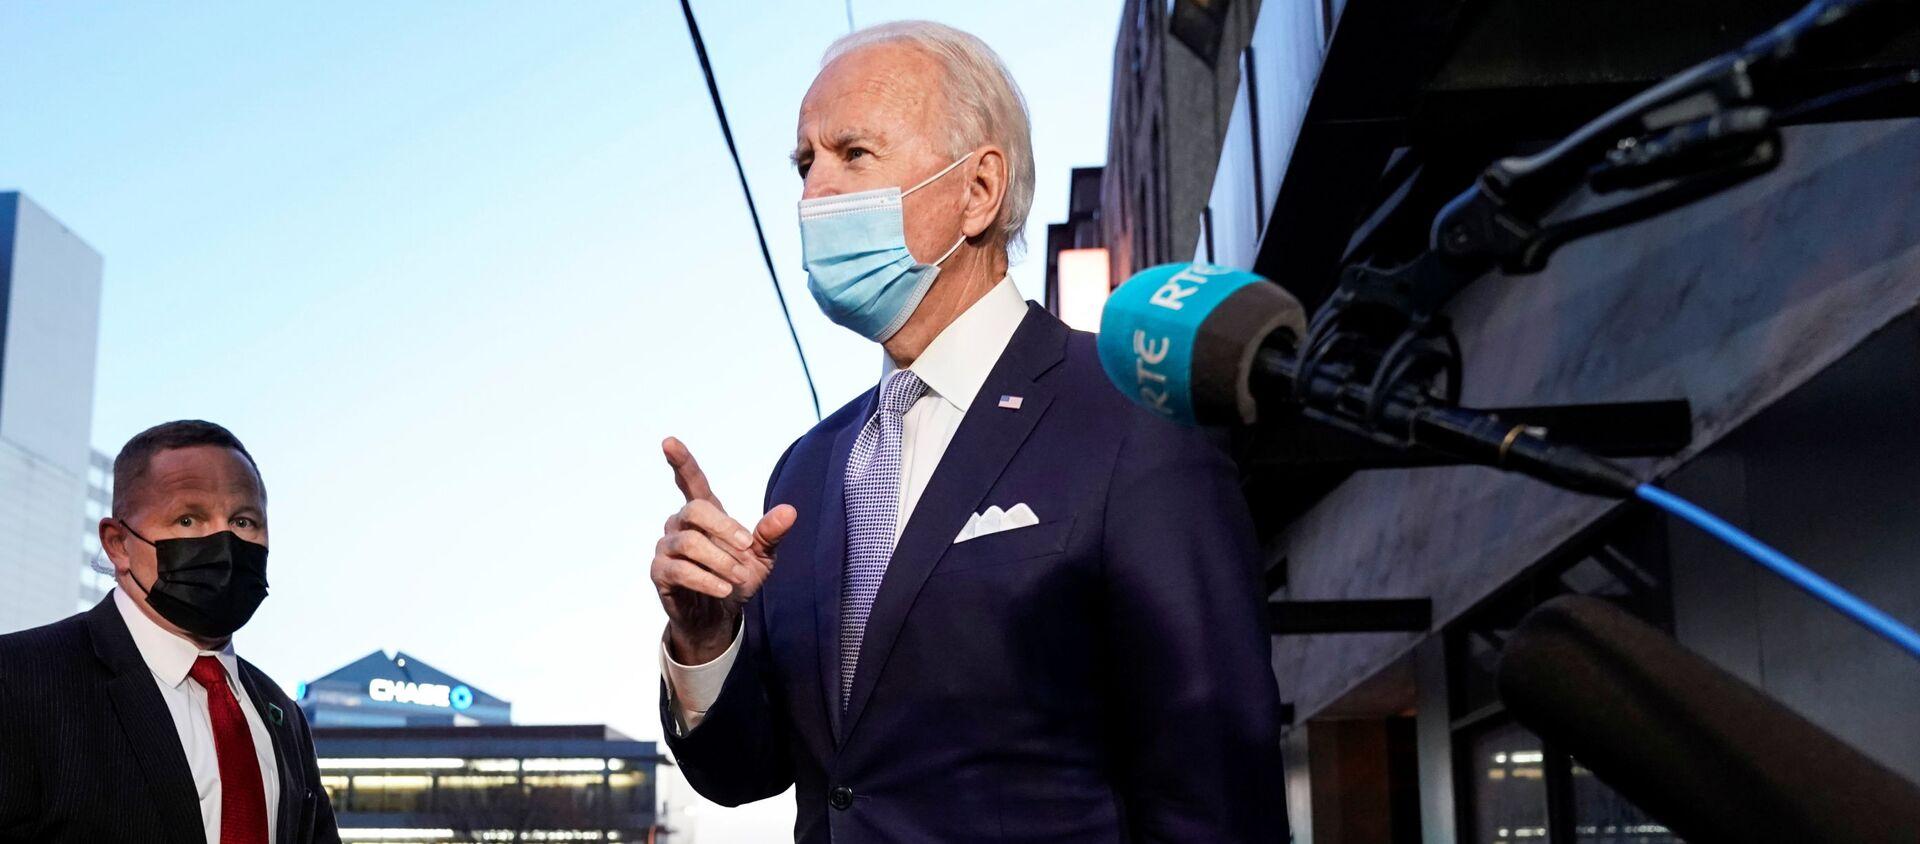 Joe Biden, presidente eletto Stati Uniti d'America - Sputnik Italia, 1920, 19.12.2020